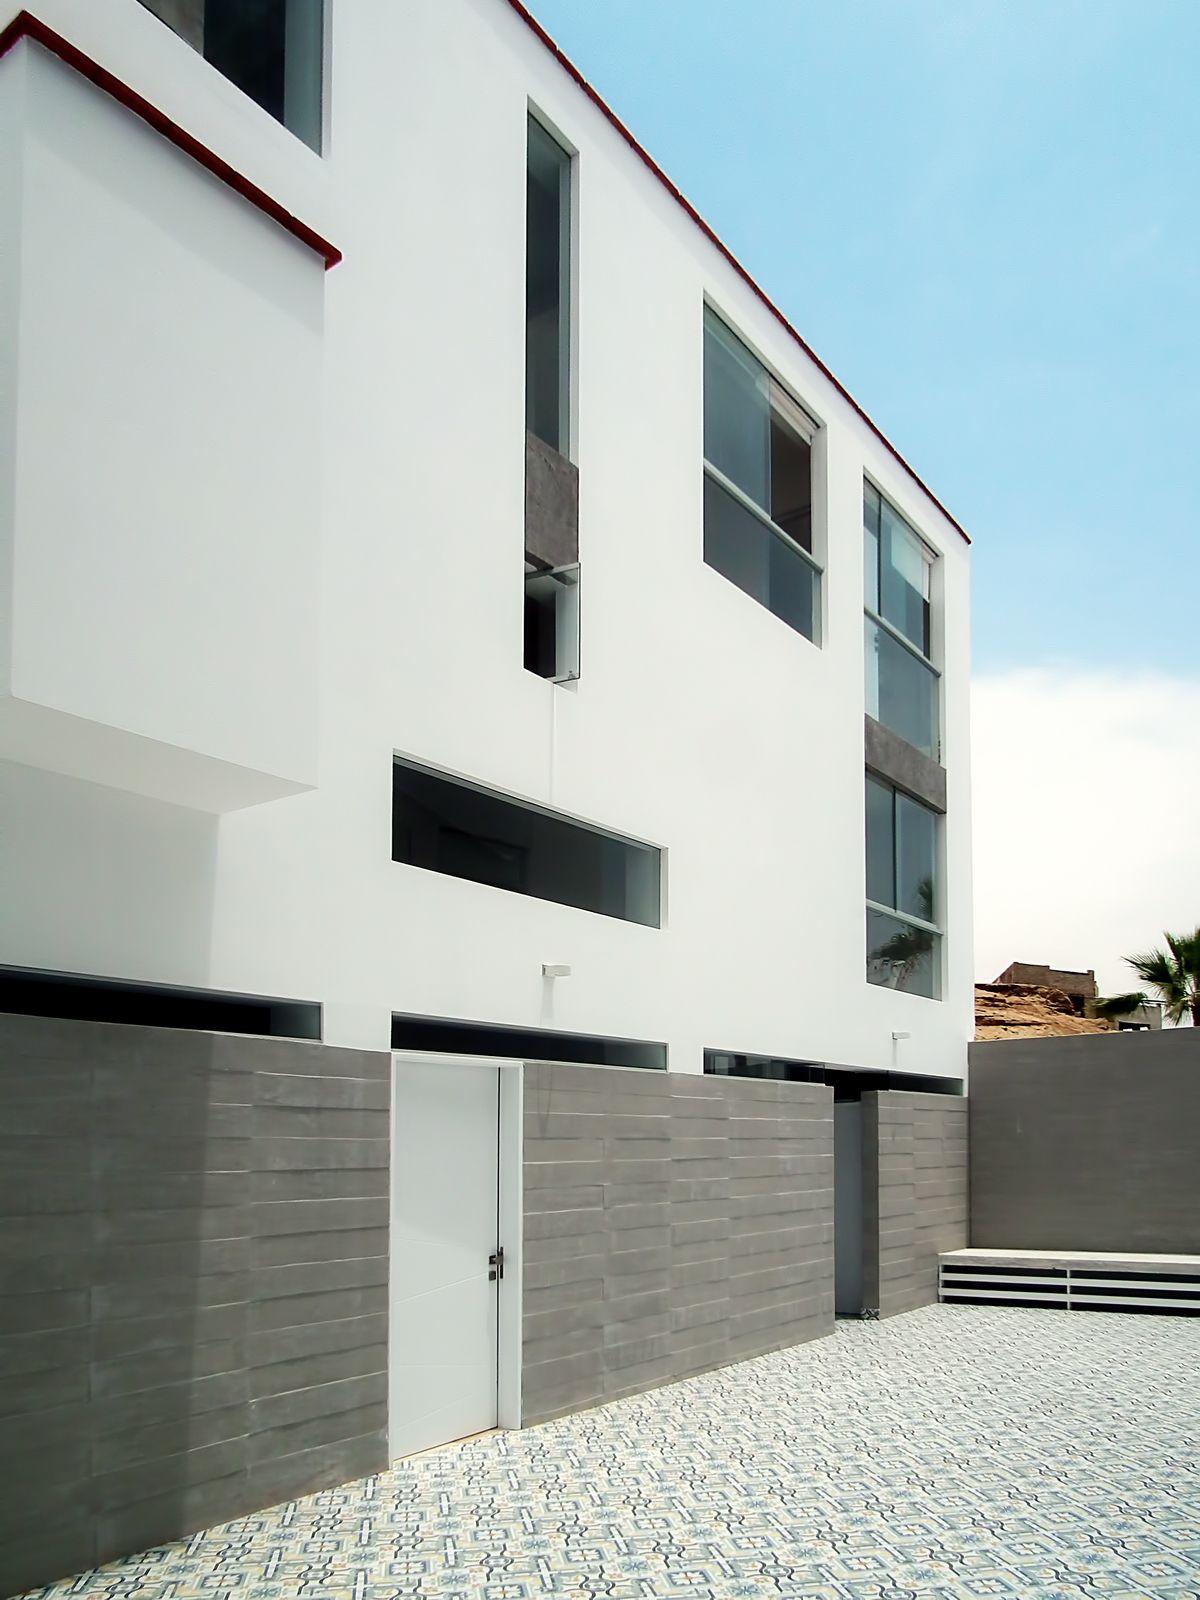 Dise o multifamiliar punta hermosa patio interior for Diseno de interiores lima